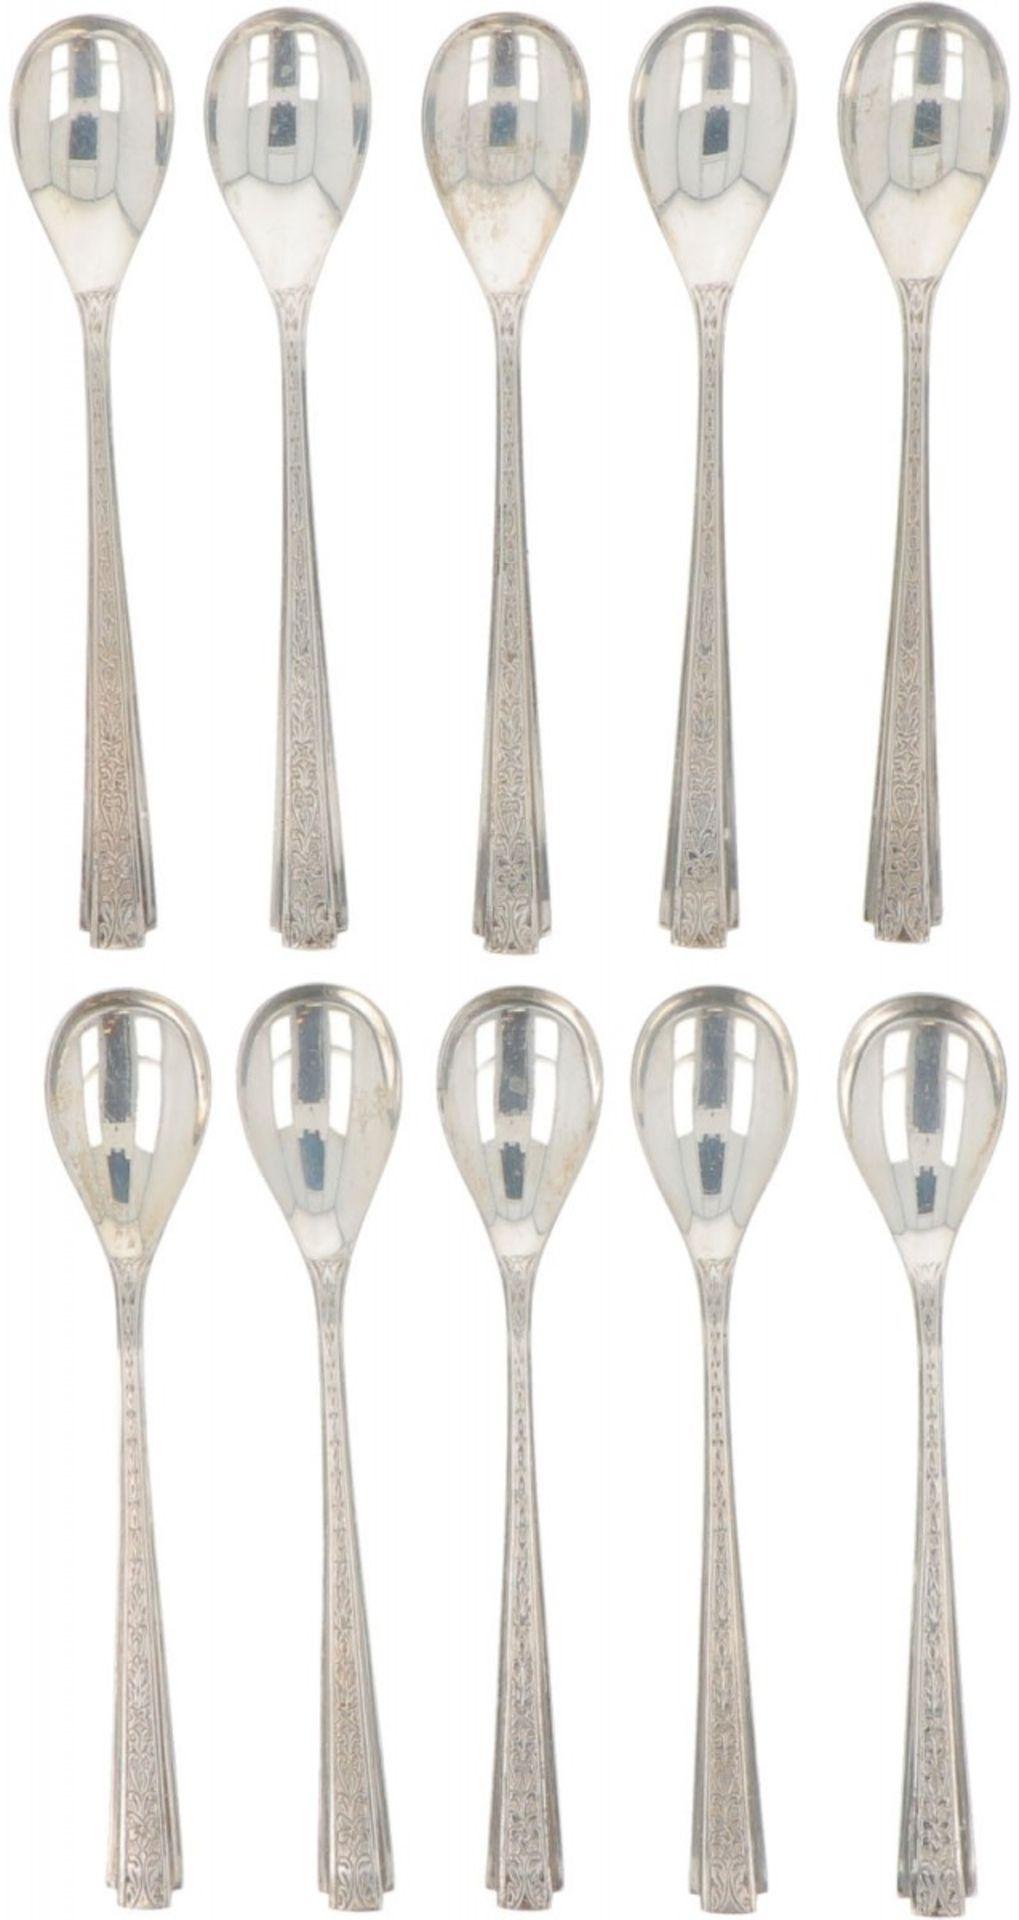 (10) piece set of silver teaspoons.